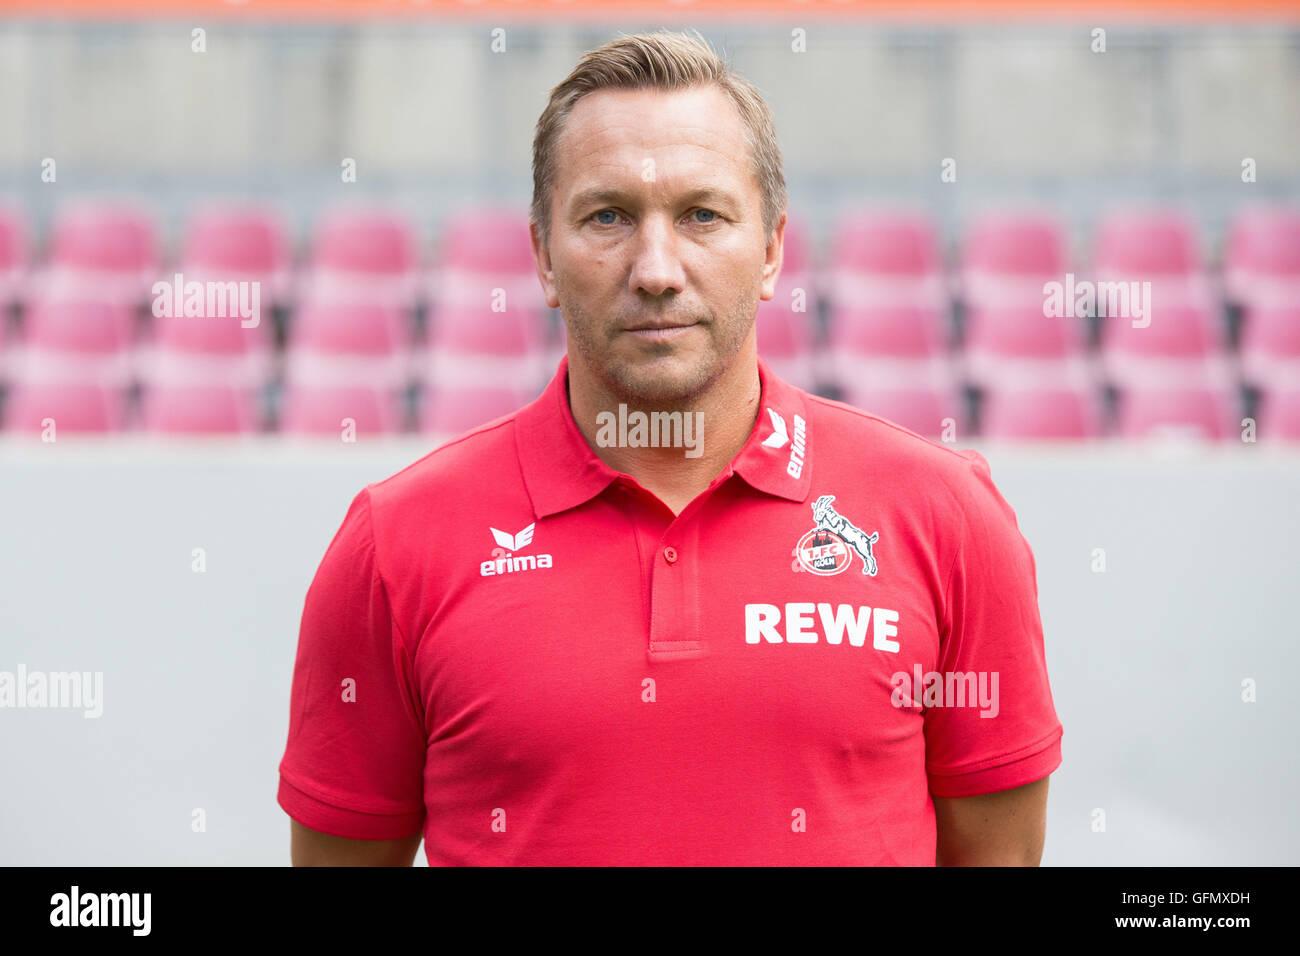 Deutsche Bundesliga Saison 201617 Fototermin 1 Fc Köln Am 18